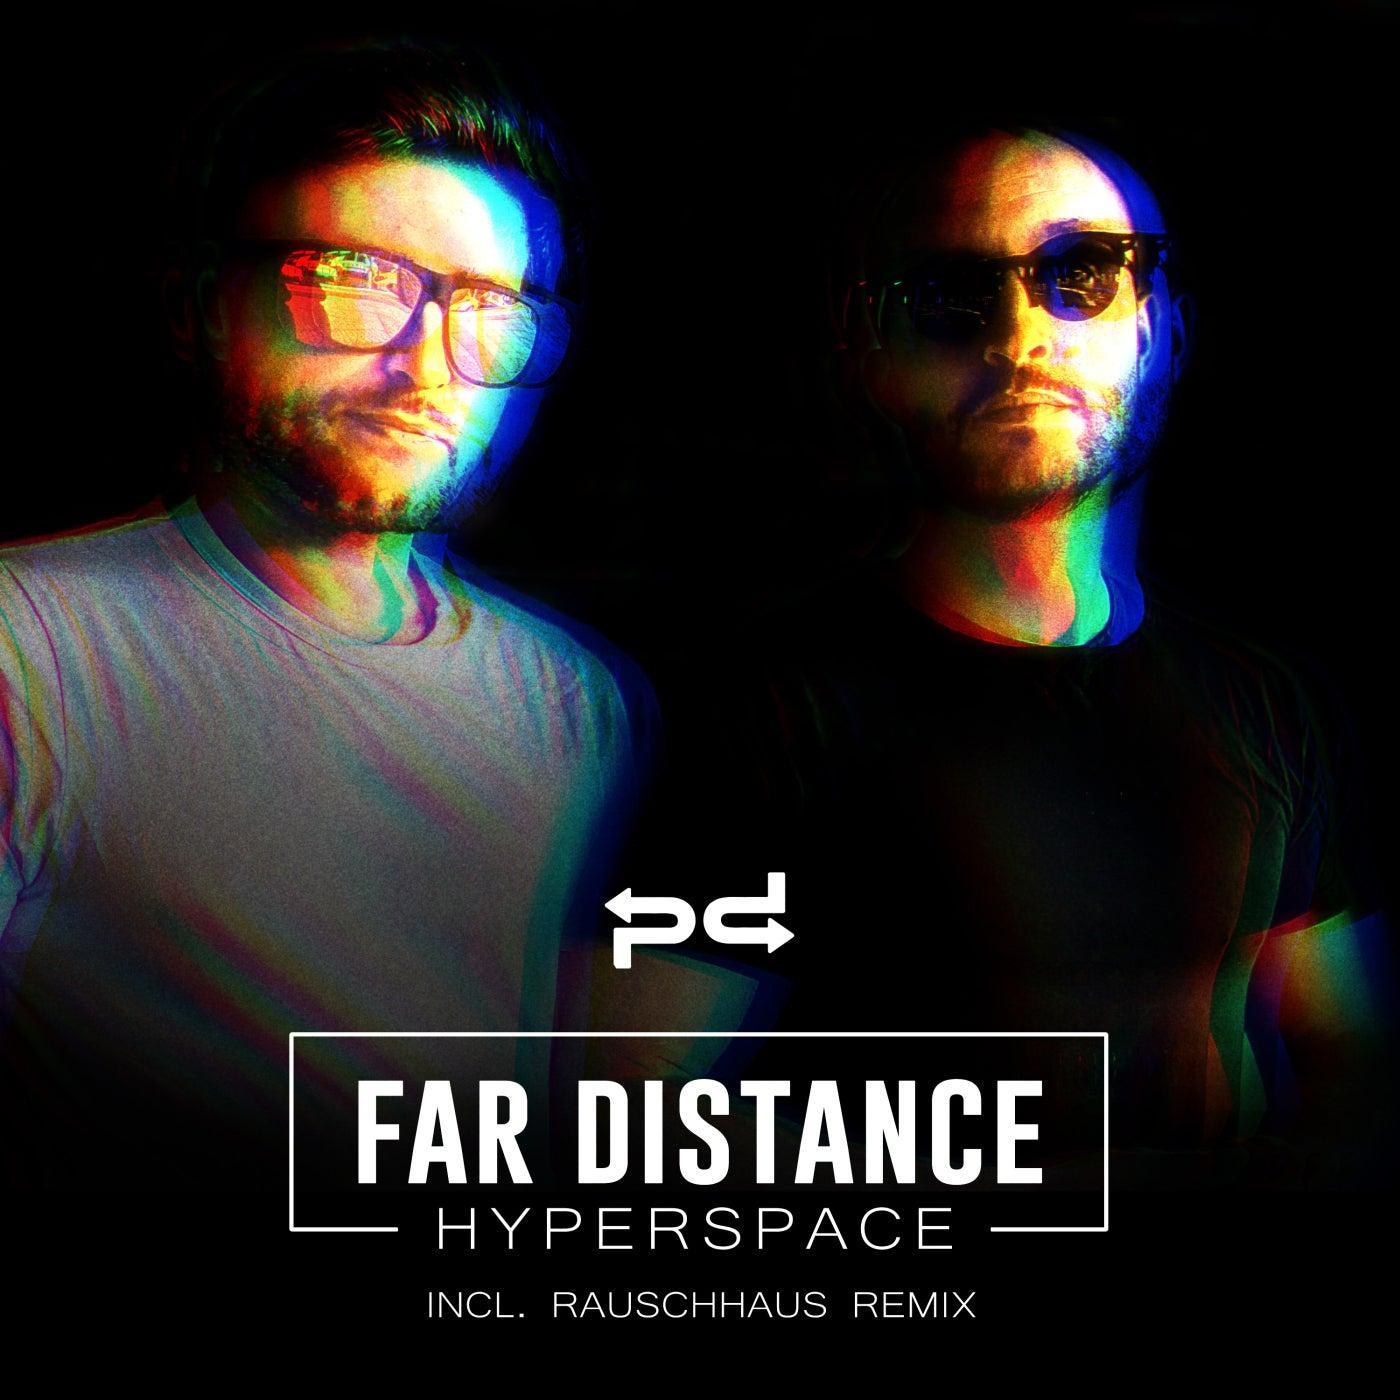 Hyperspace (Rauschhaus Remix)